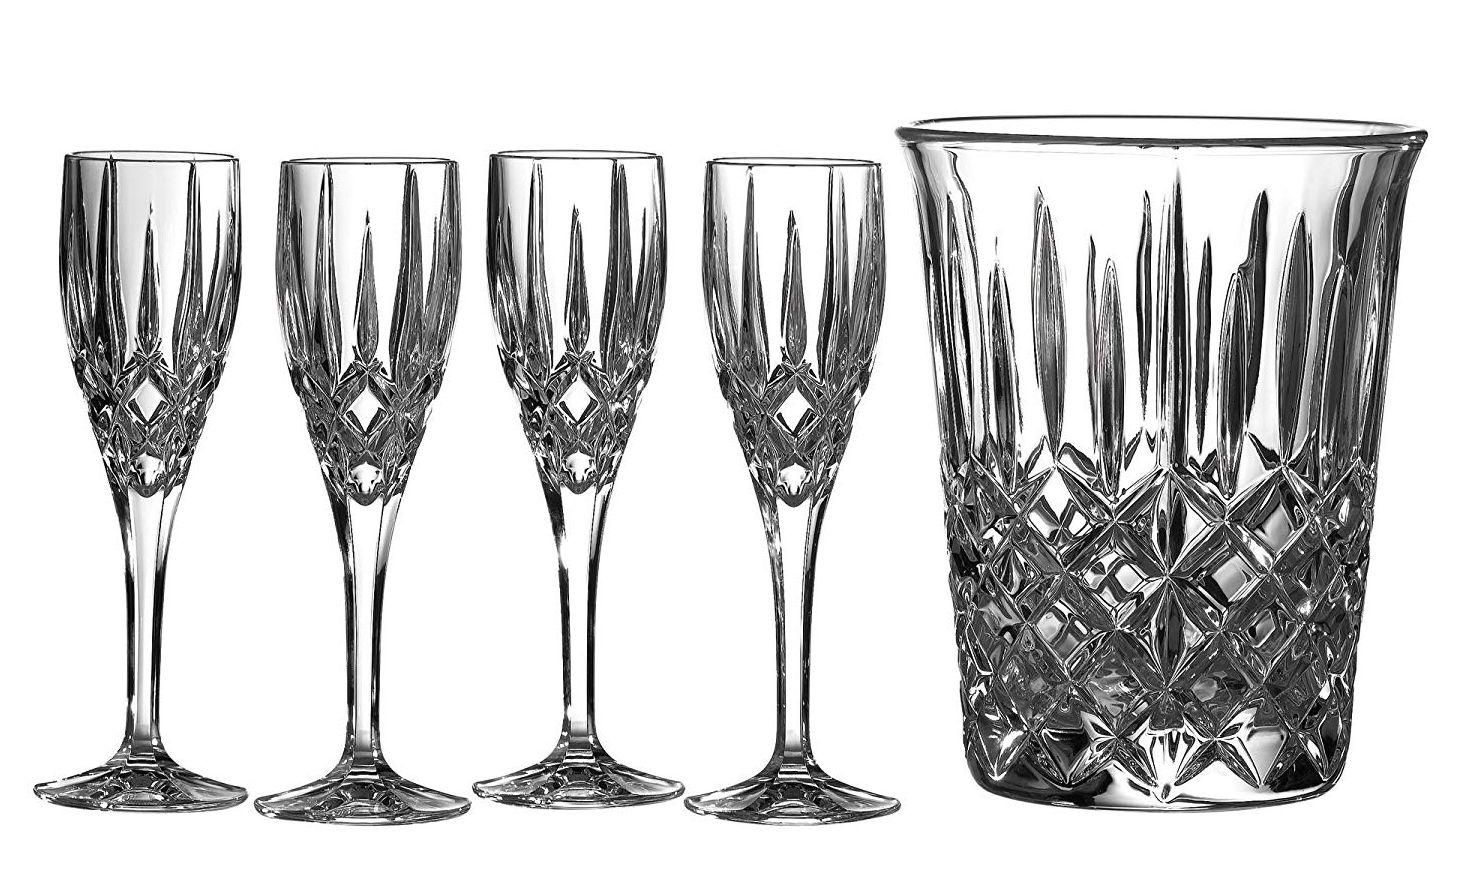 Royal_Doulton_Champagneset_Highclere